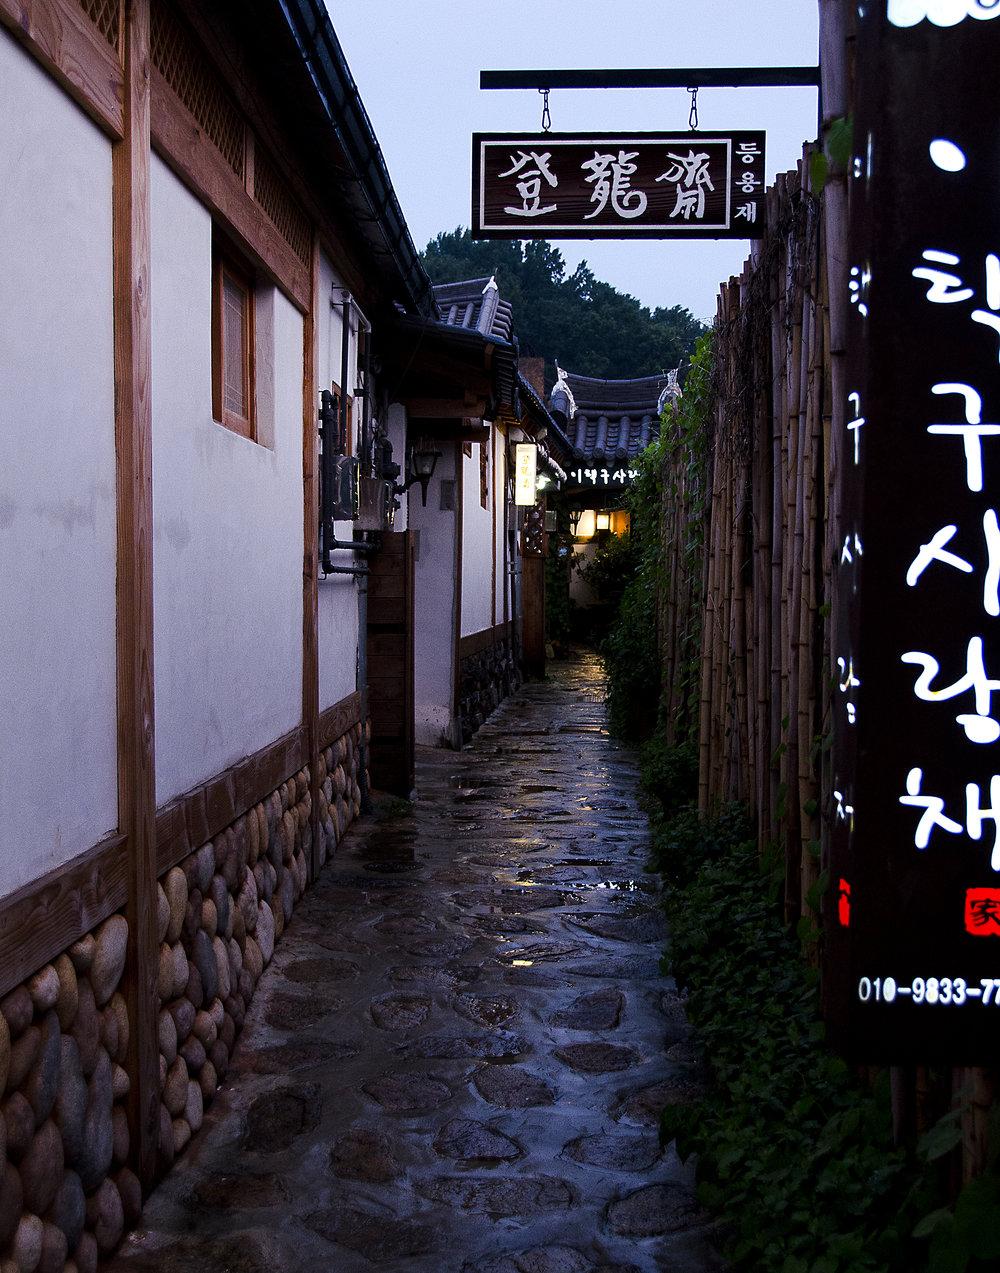 Spencer_Drake_Korean_Alleyway_Photography_korea_alleyway_traditional_architecture_travel_chinese_hanok.jpg